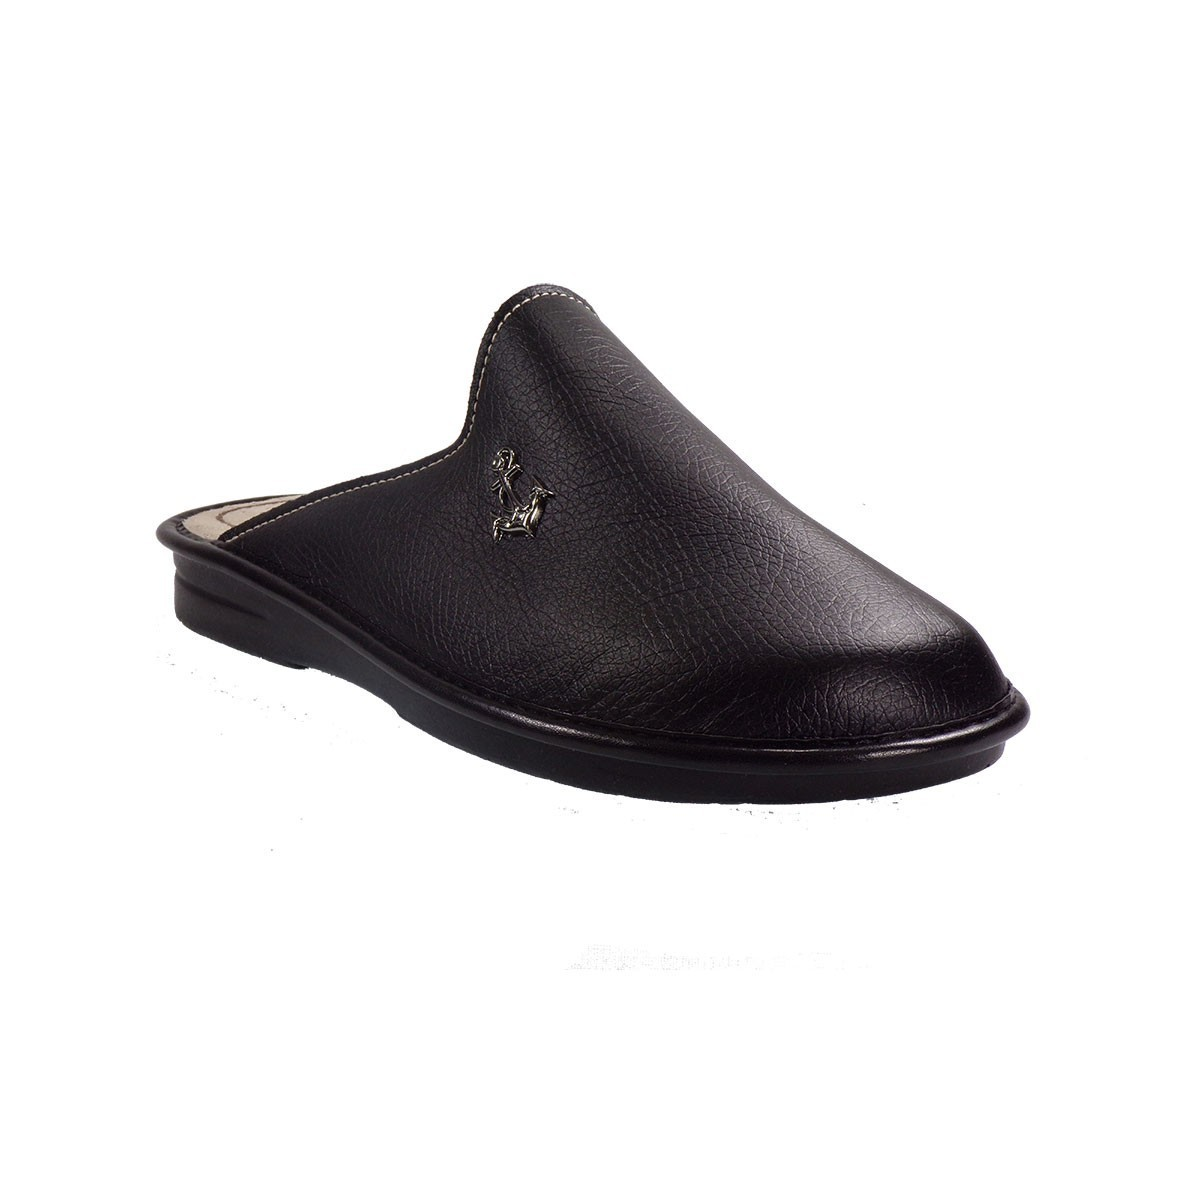 COMFORT CLASSICO Ανδρικές Παντόφλες 00510 Μαύρο